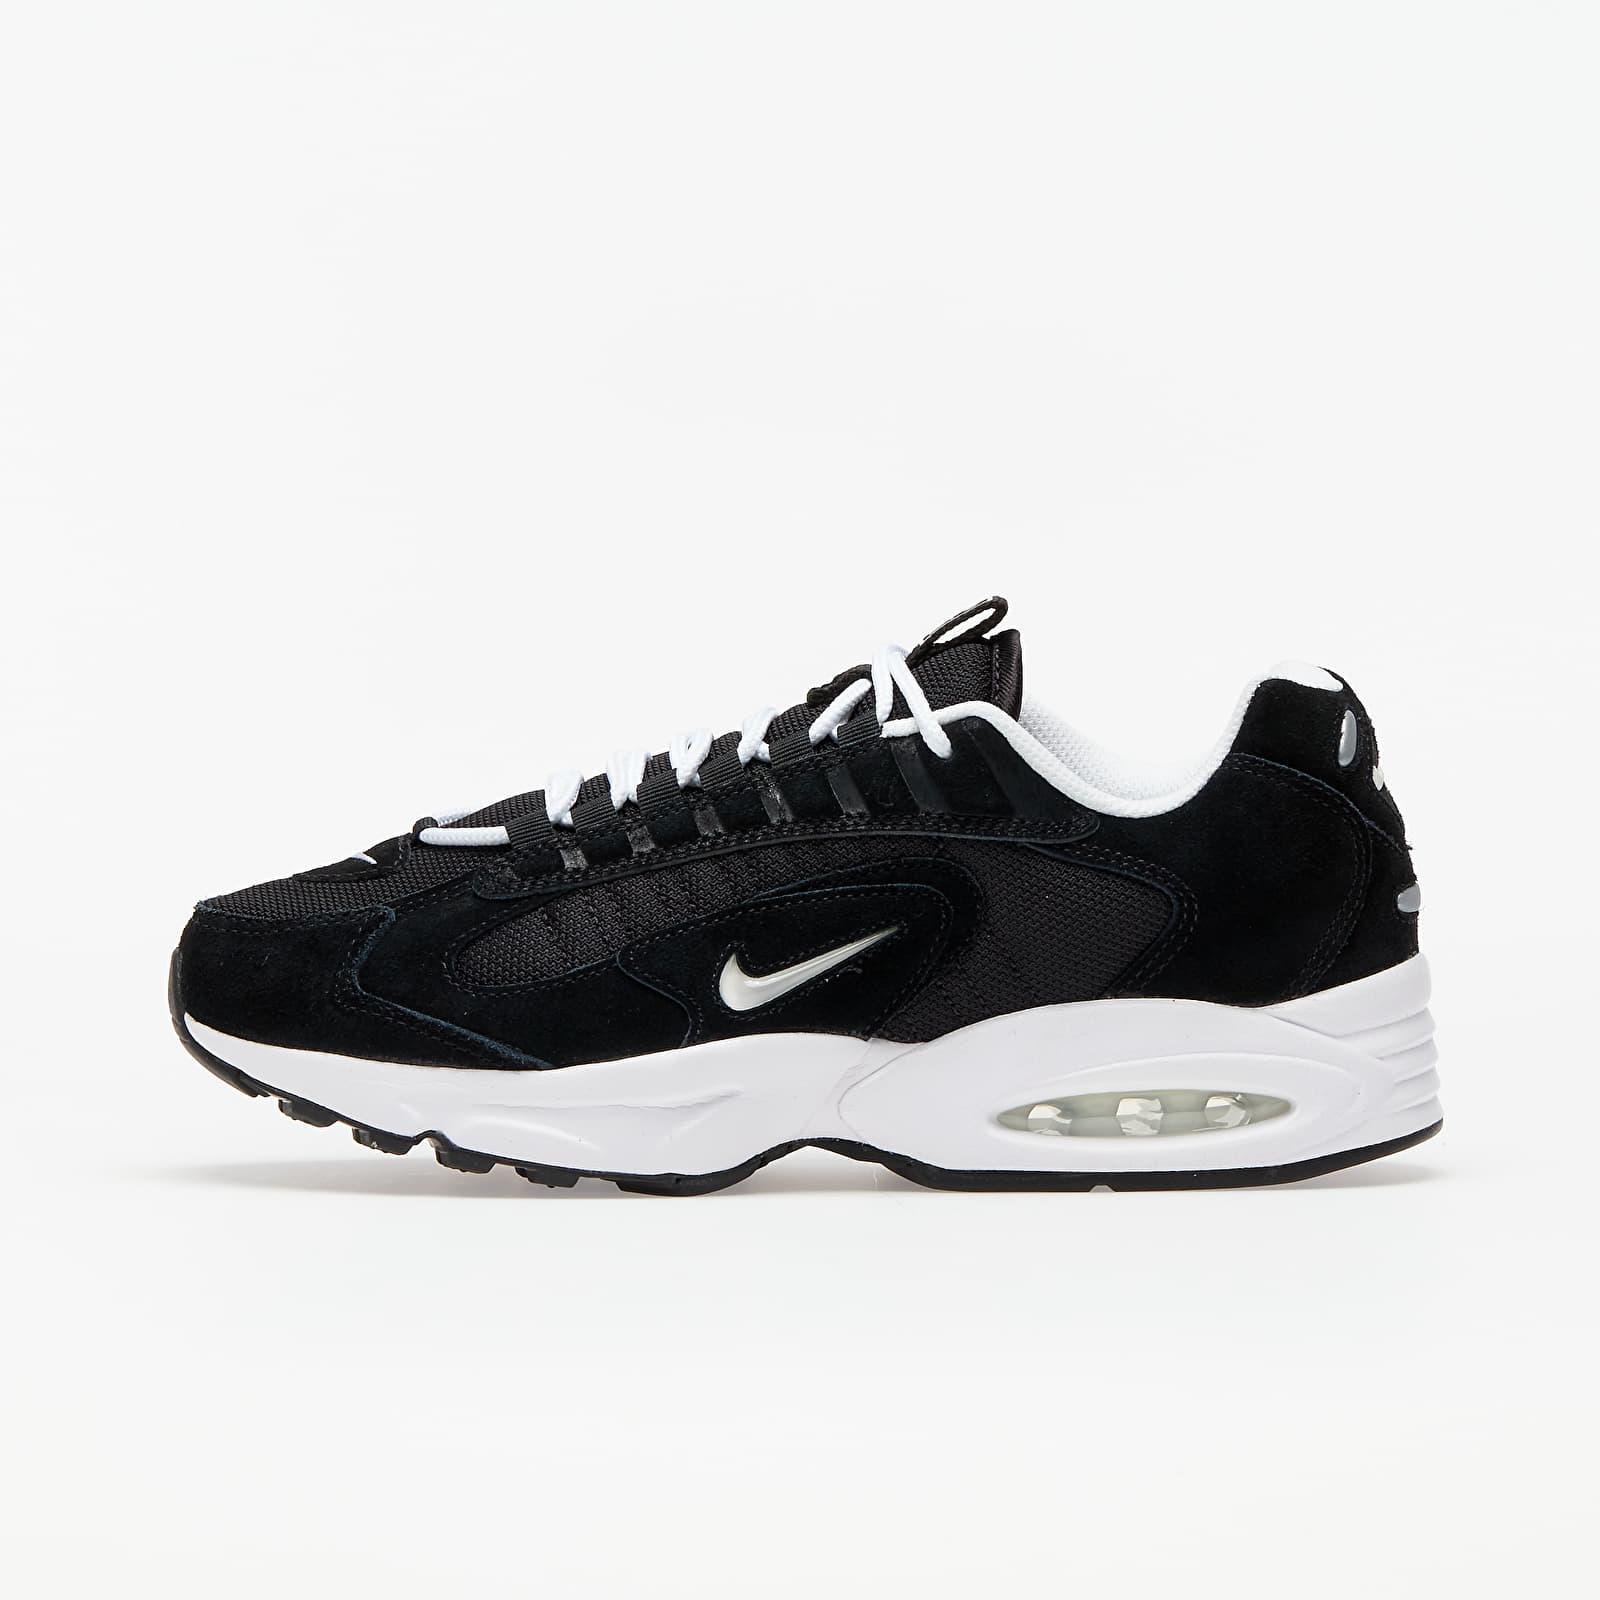 Men's shoes Nike Air Max Triax LE Black/ White